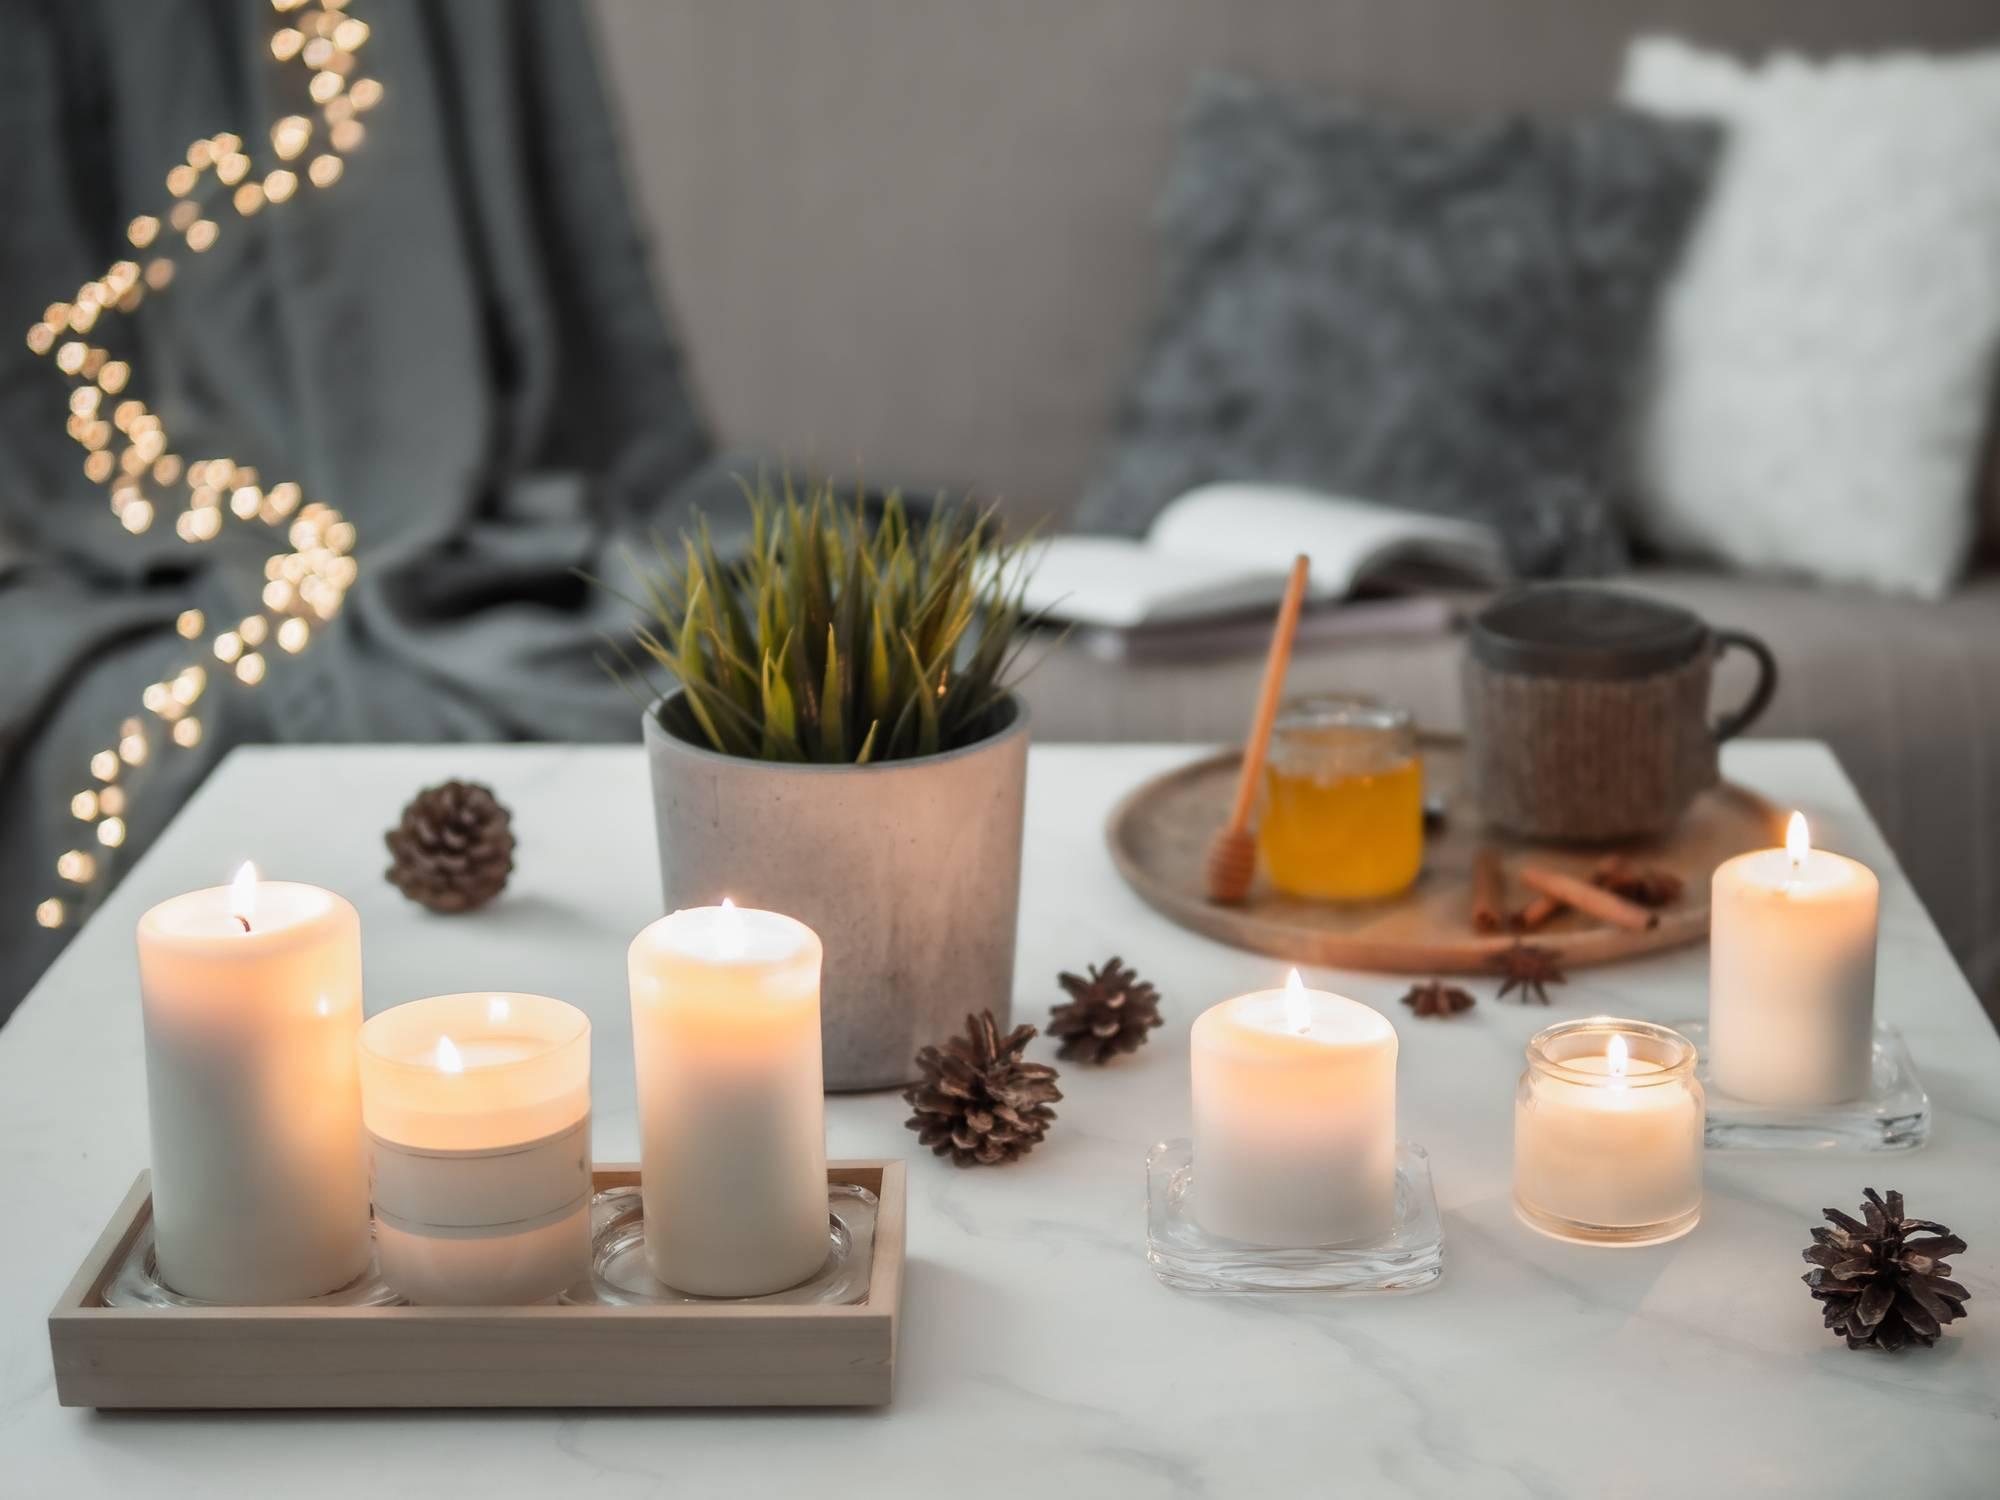 des bougies parfumées